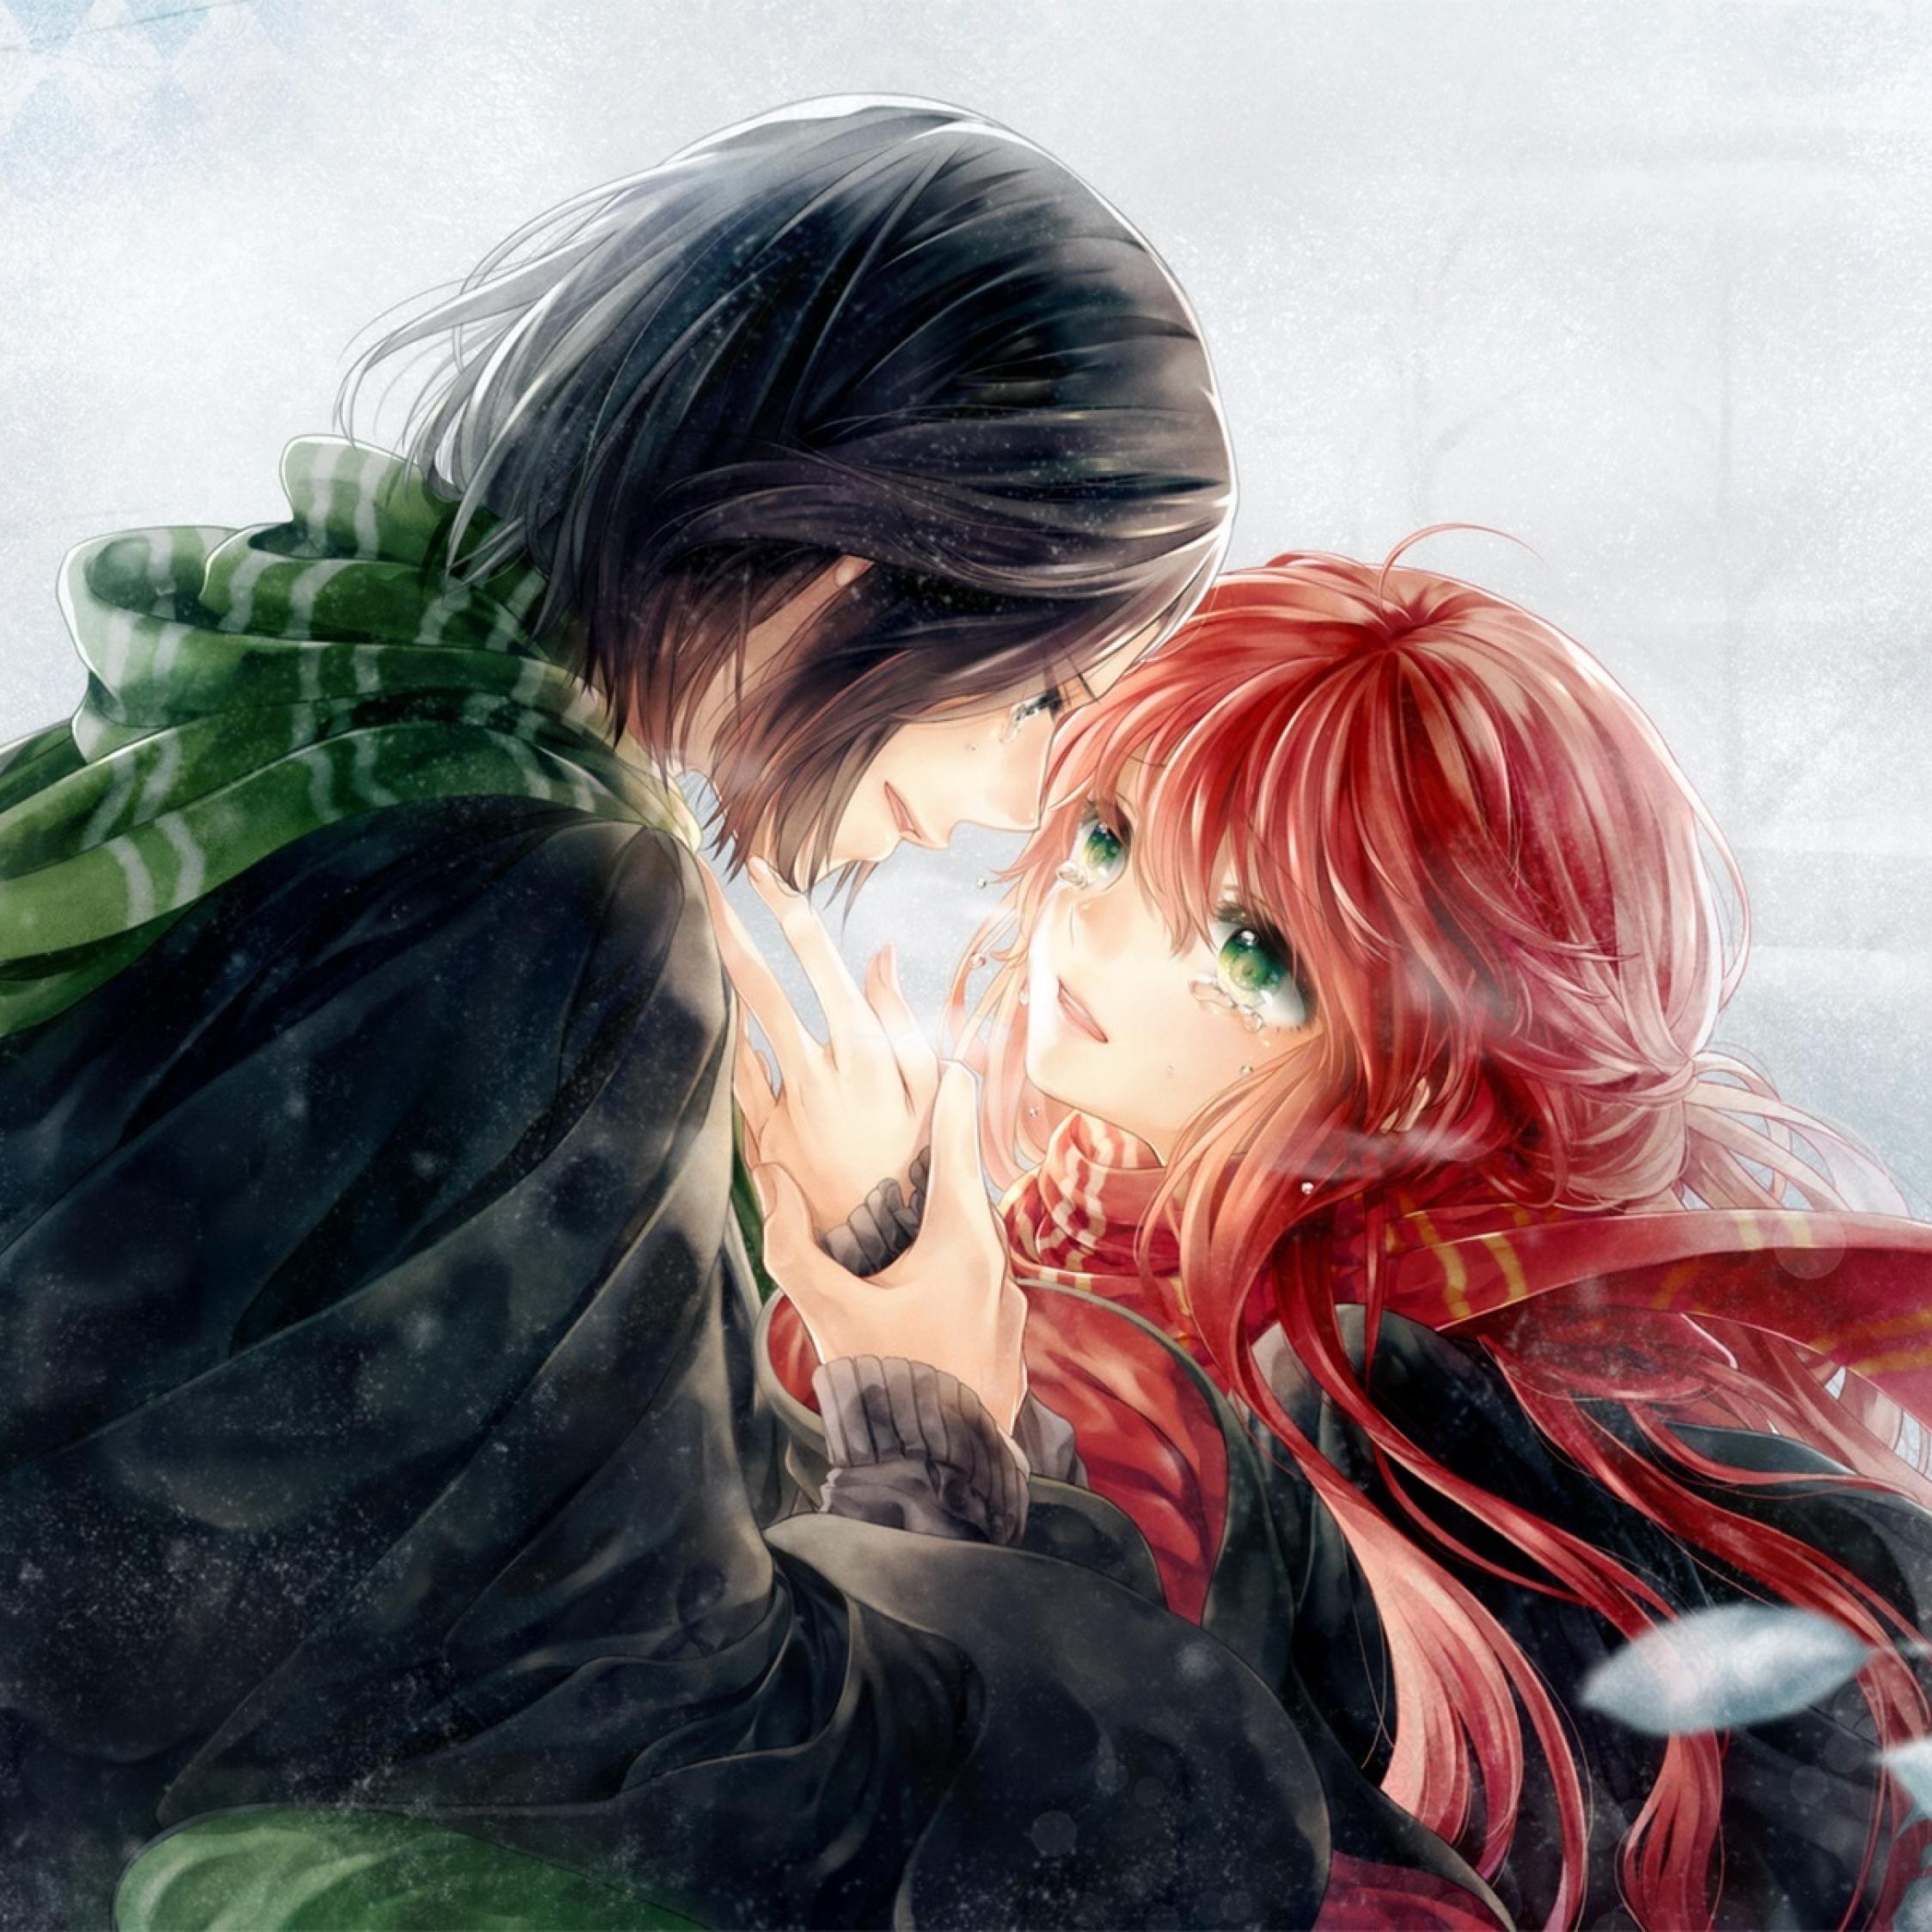 Amazing Wallpaper Harry Potter Ipad - harry-potter-severus-snape-lily-evans_11282_2248x2248  Image_246371.jpg